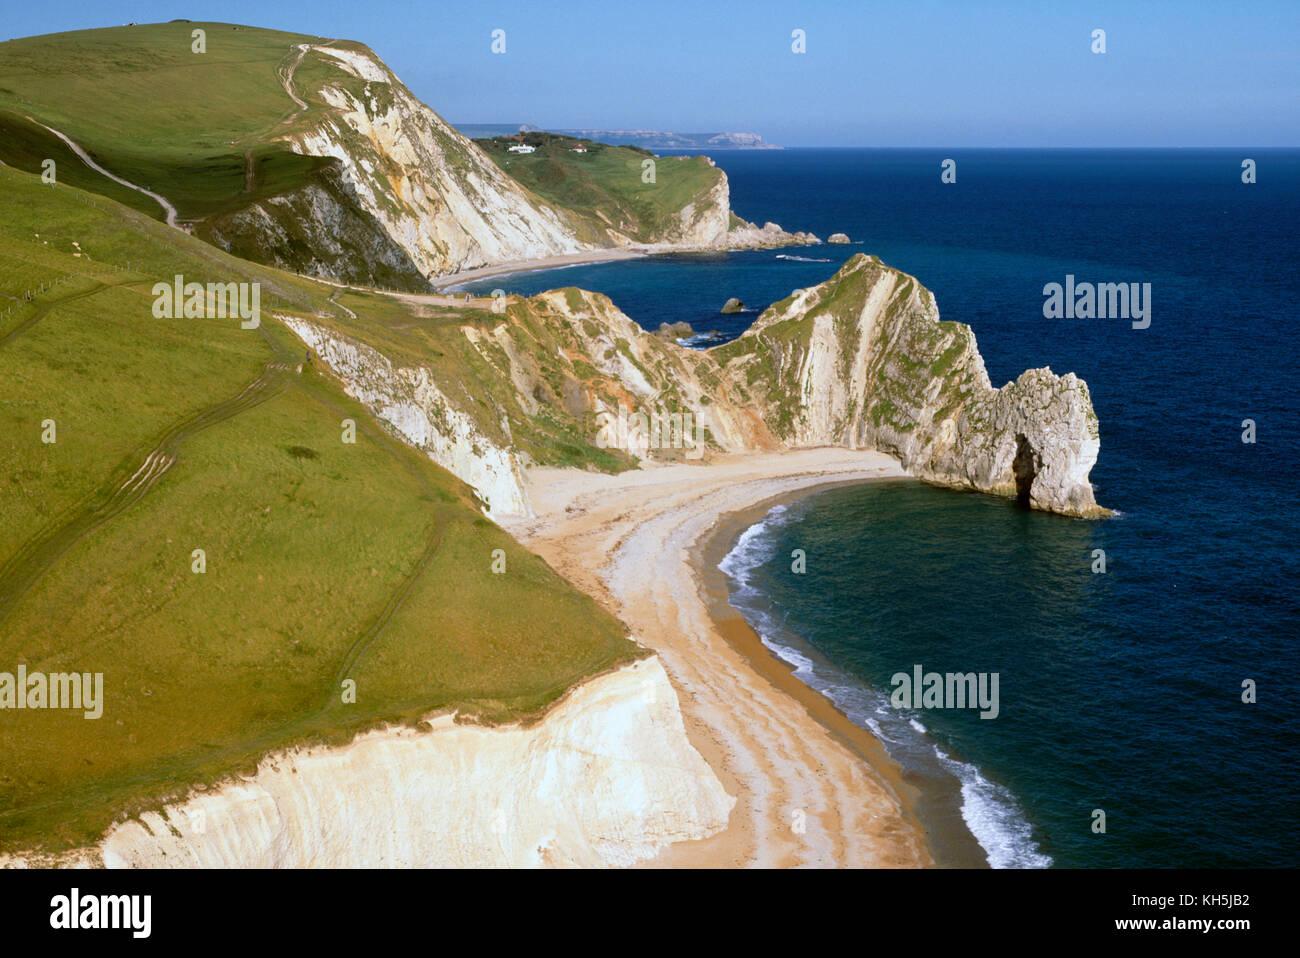 Durdle Door and the Man o' War Bay on the Jurassic Coast, Dorset, England, UK. - Stock Image